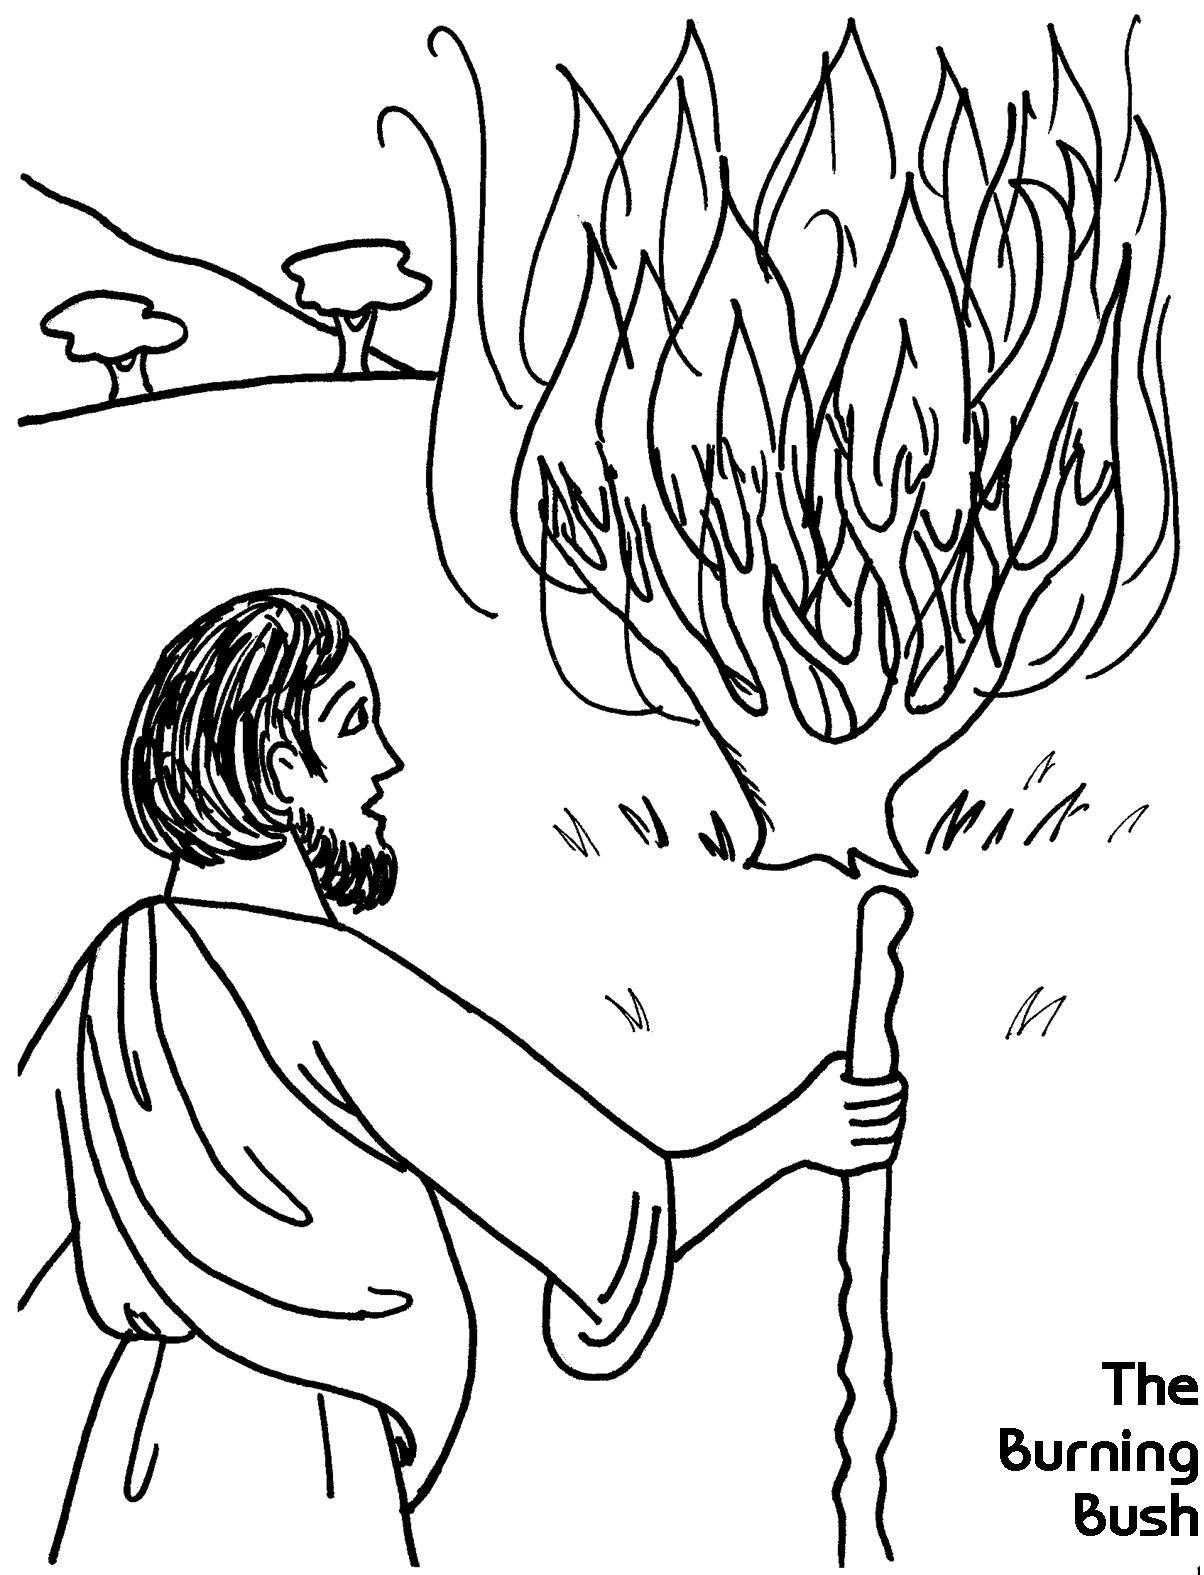 Moses And The Burning Bush Coloring Page At Getdrawings Com Free